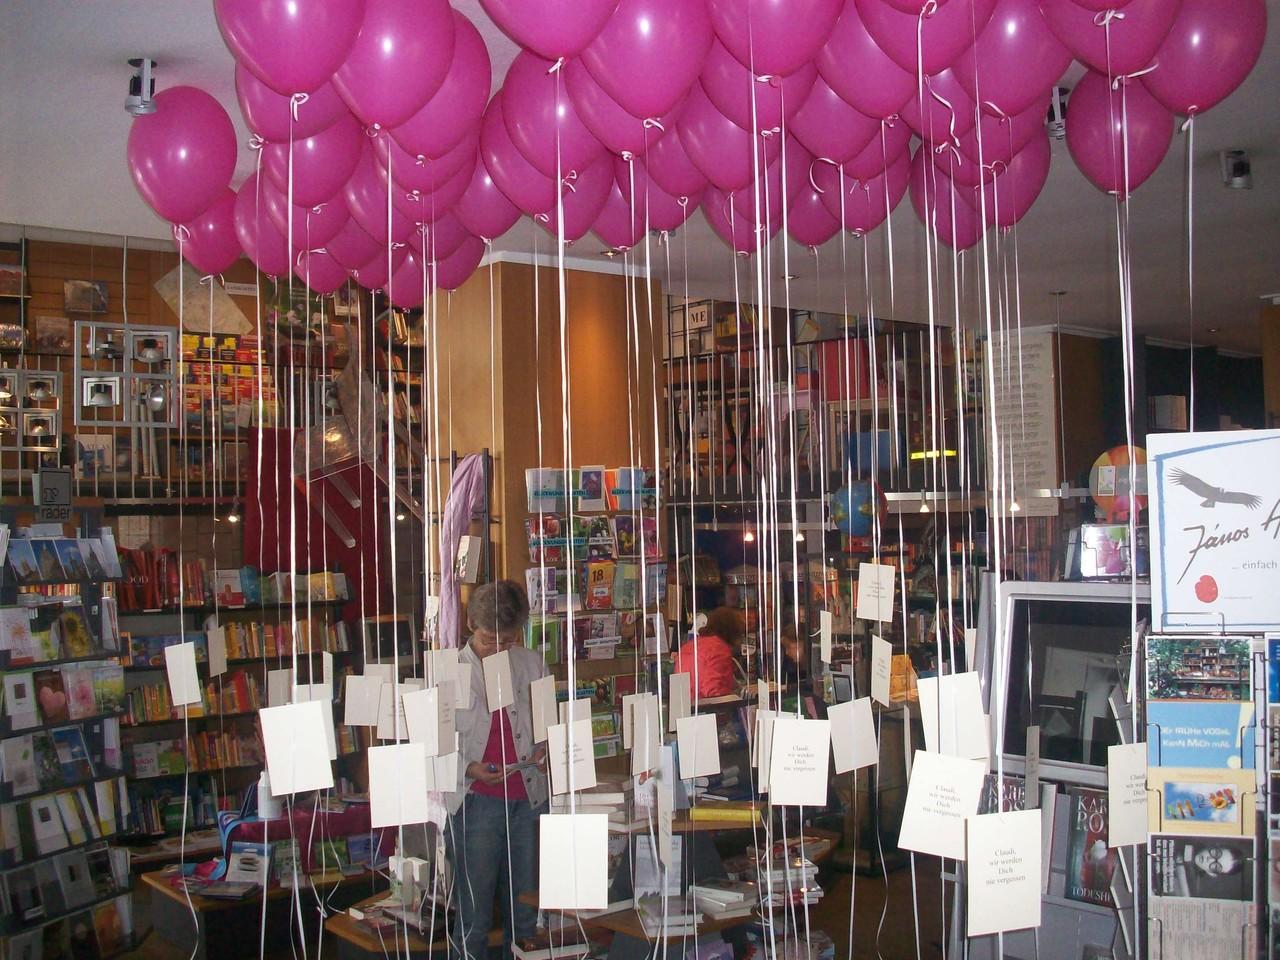 schwebende ballons ballonwerkstatt orsbeck. Black Bedroom Furniture Sets. Home Design Ideas